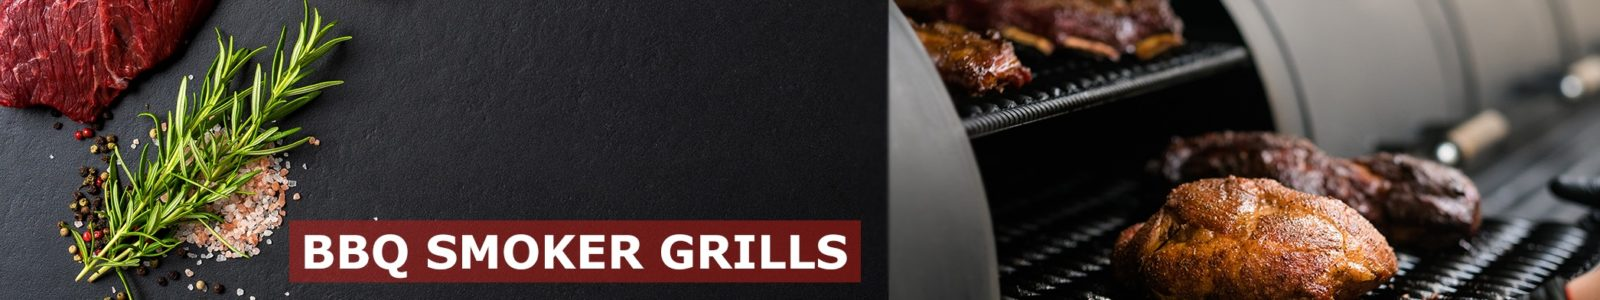 BBQ Smoker Grills